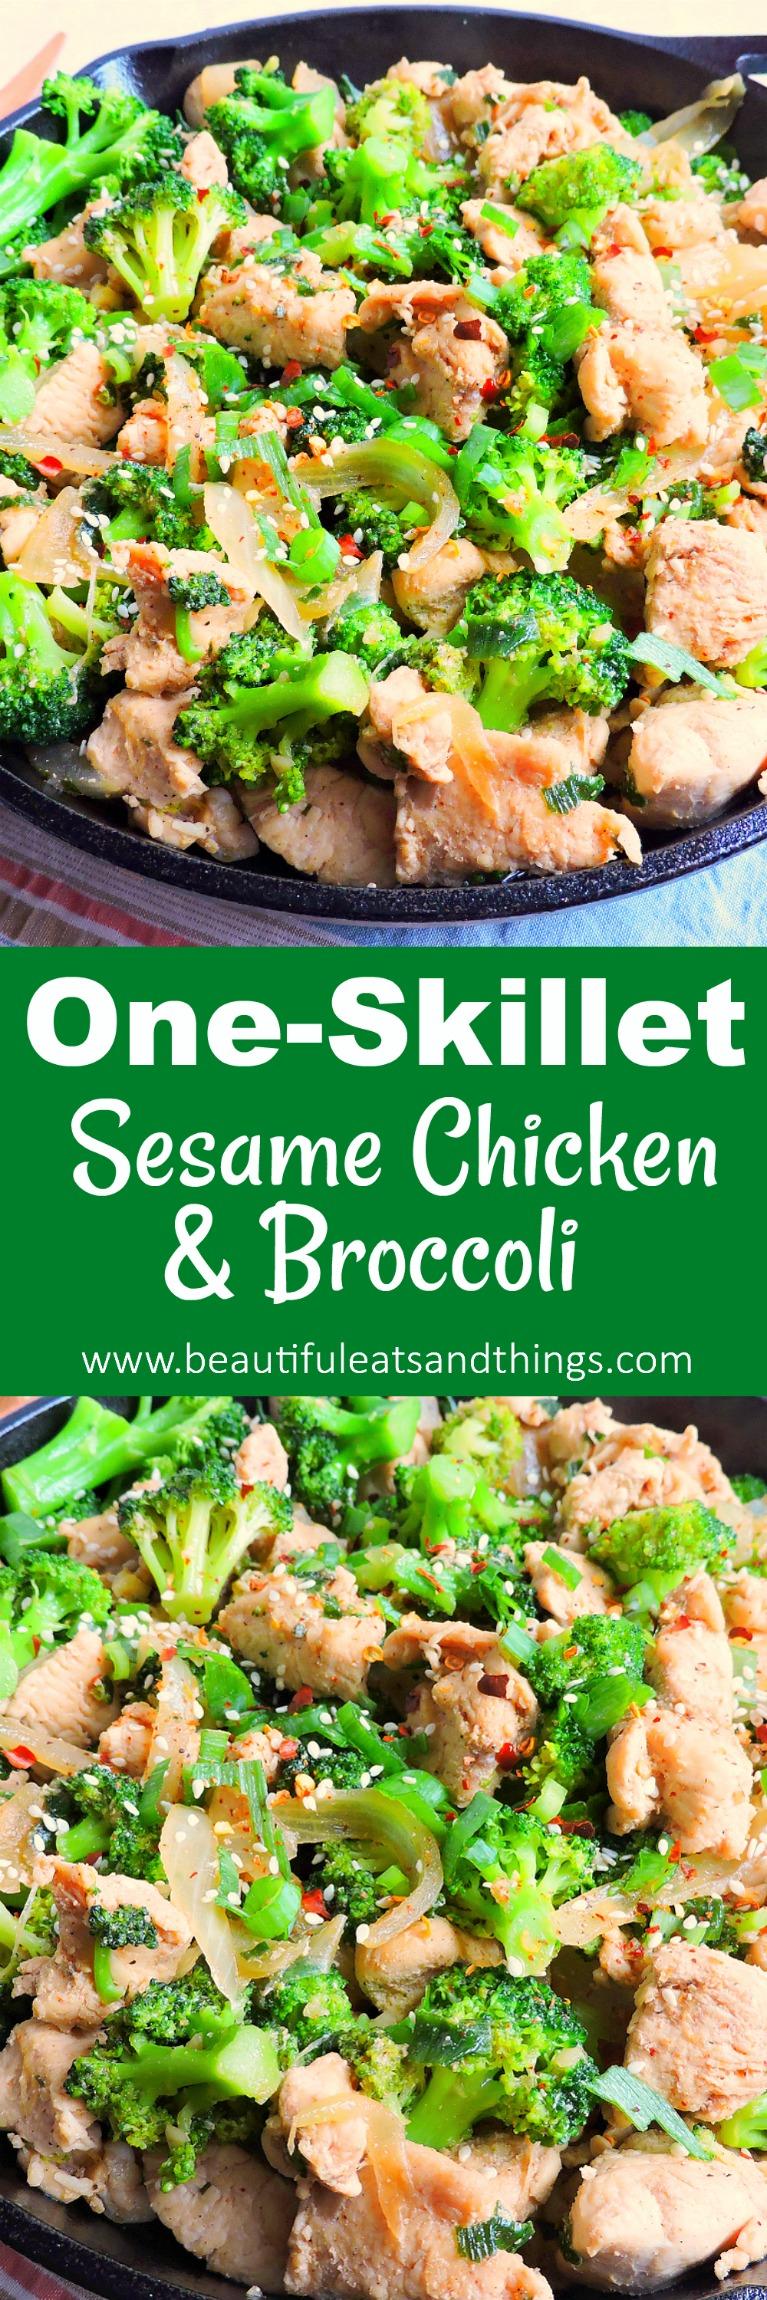 One-Skillet Sesame Chicken & Broccoli